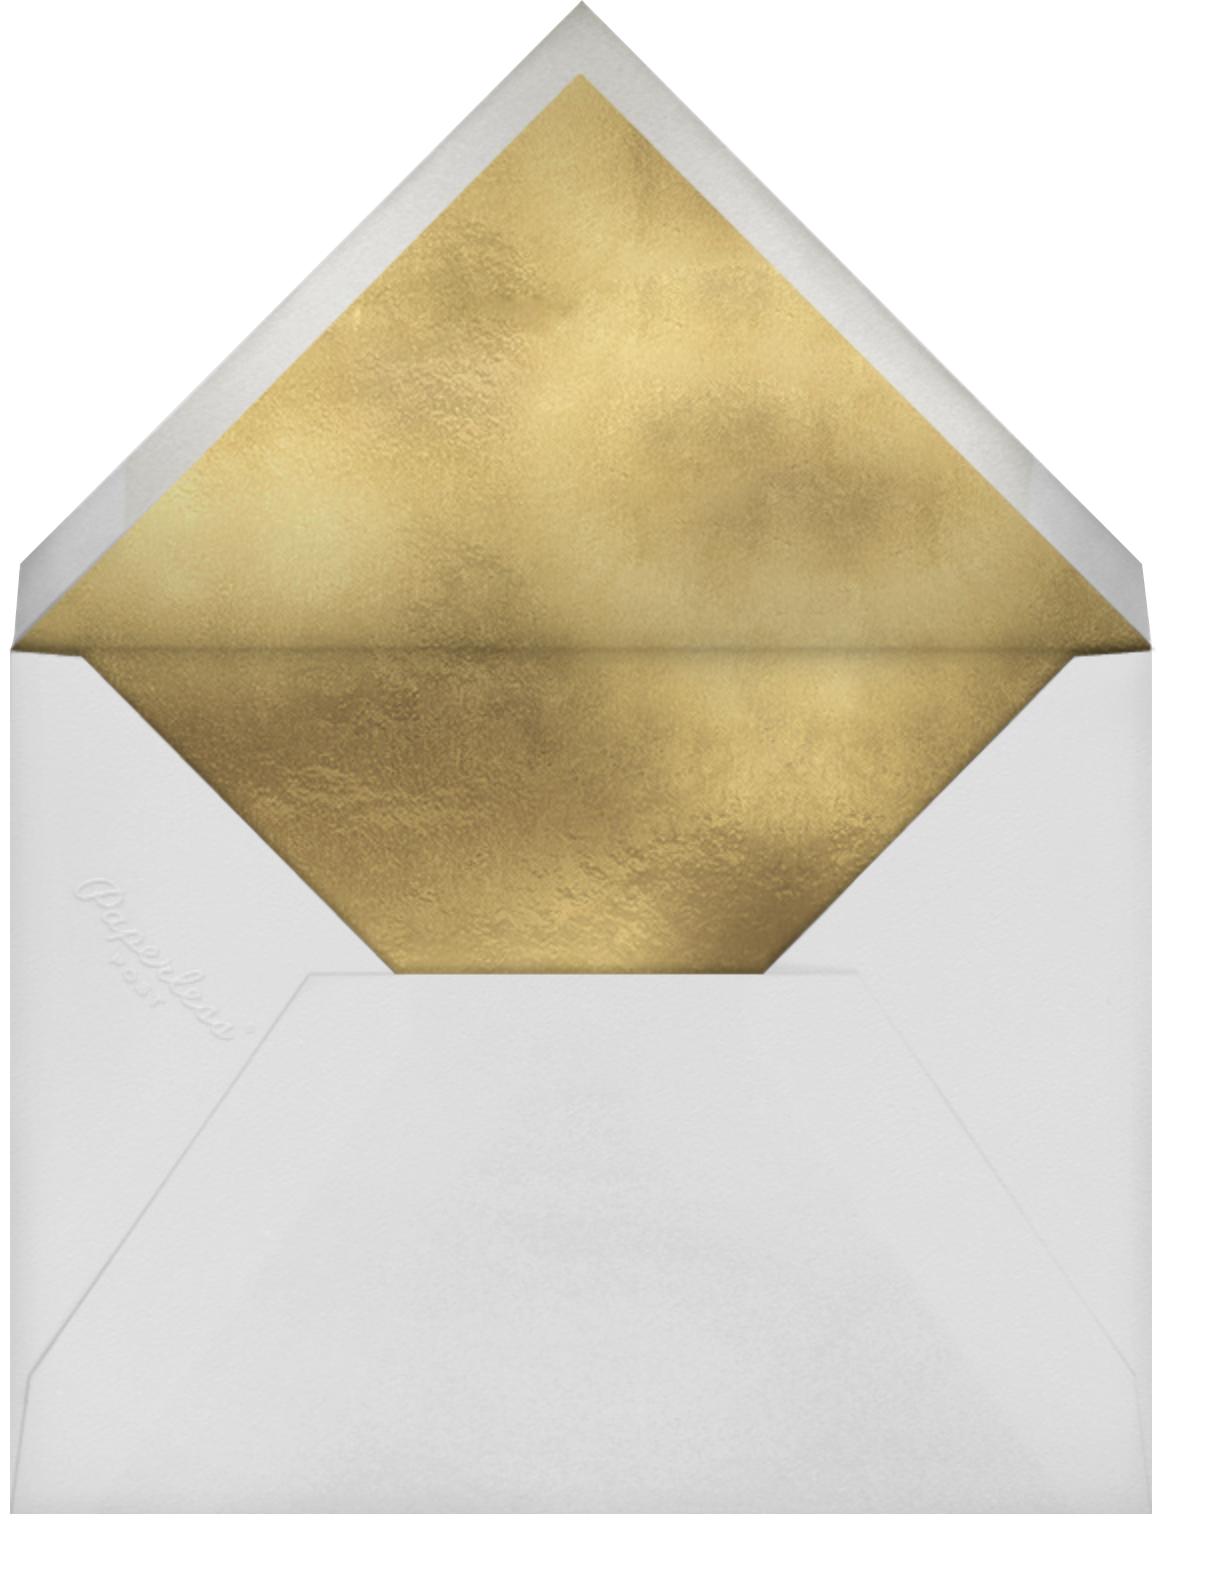 Belle Boulevard - Gold - kate spade new york - Envelope